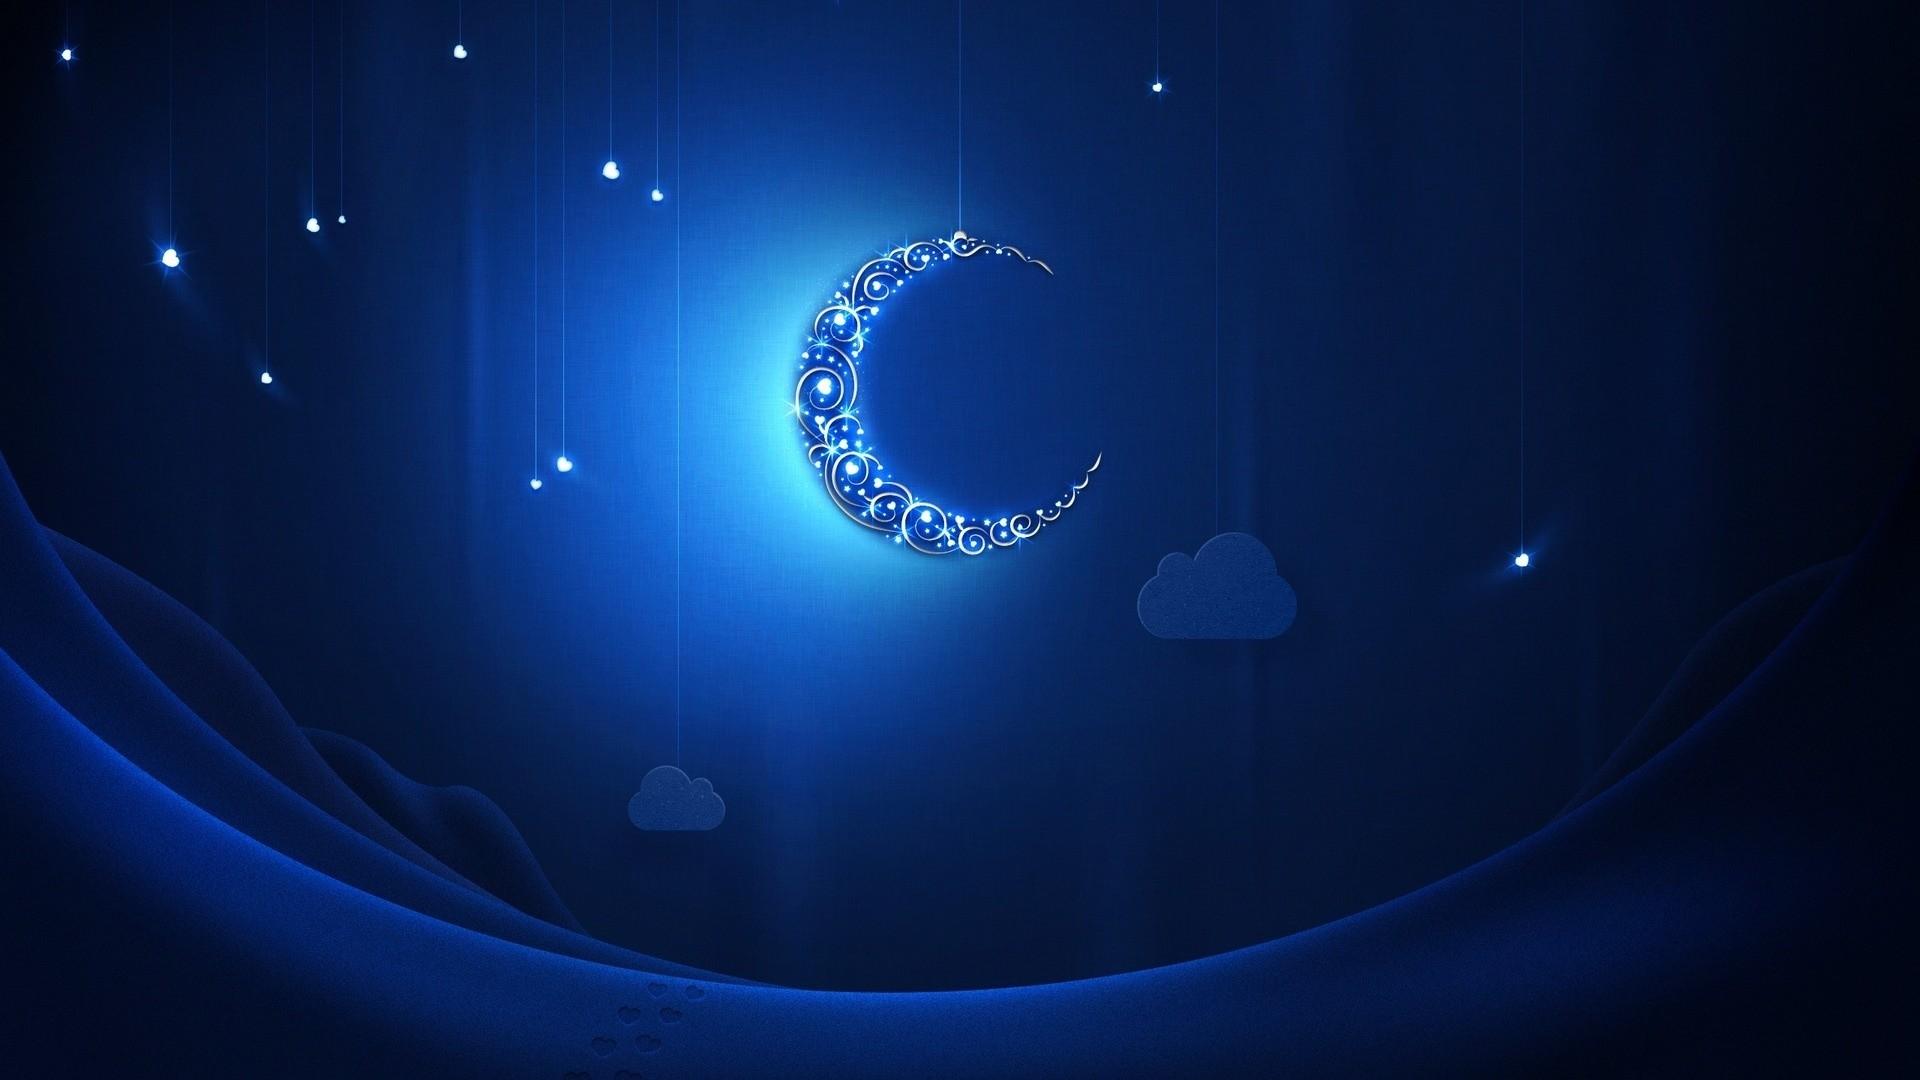 … wallpaper moon stars clouds simple desktop wallpaper 3d …